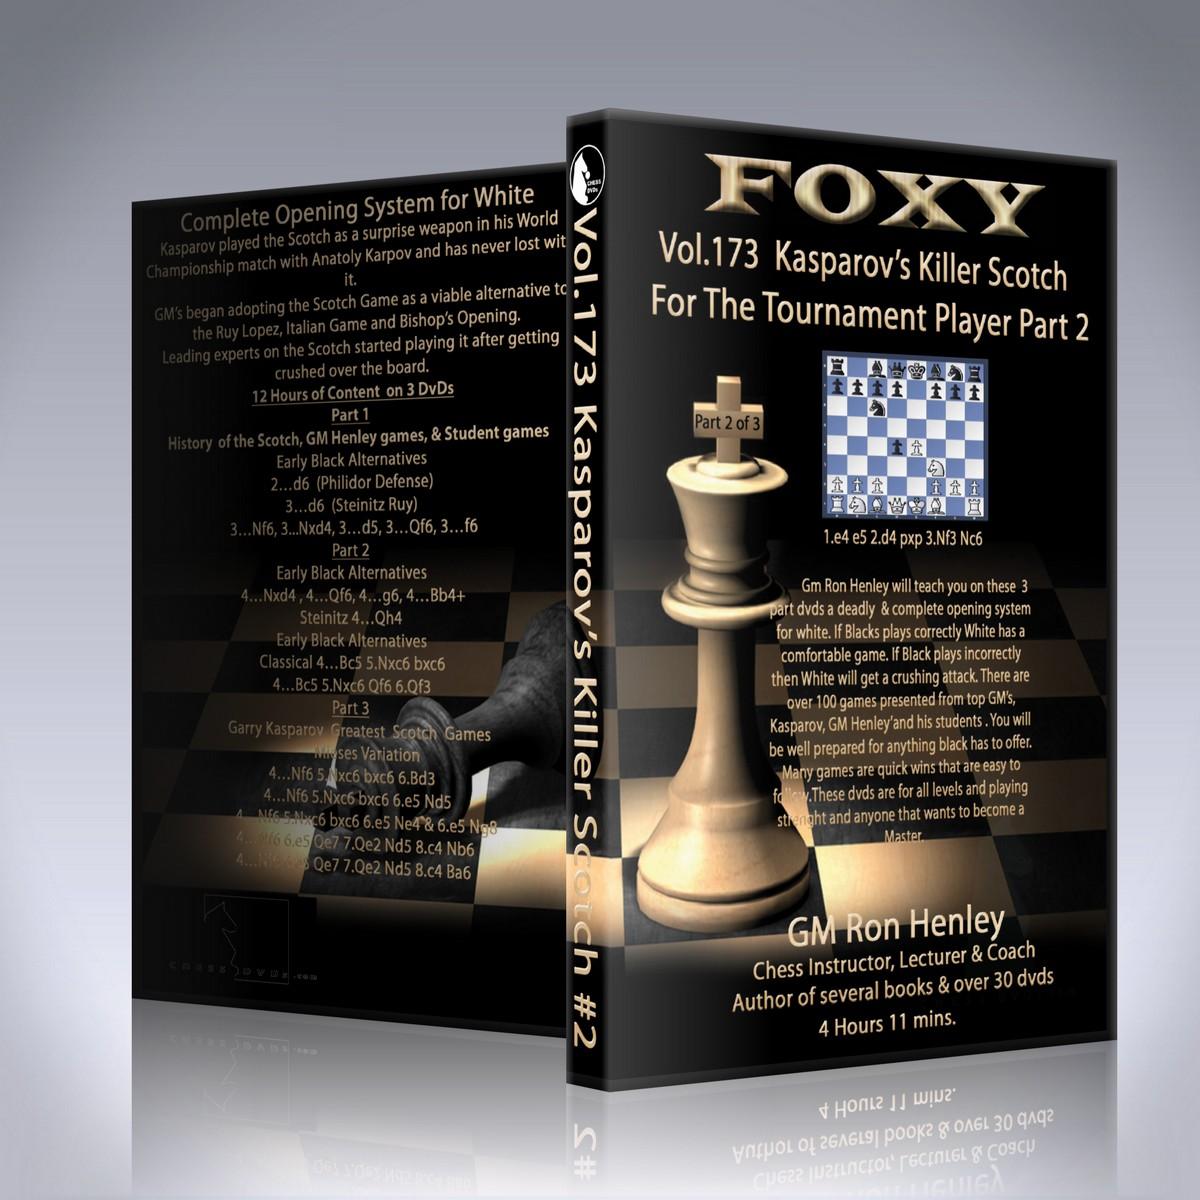 Kasparov's Killer Scotch For The Tournament Player Part 2 – GM Ron Henley